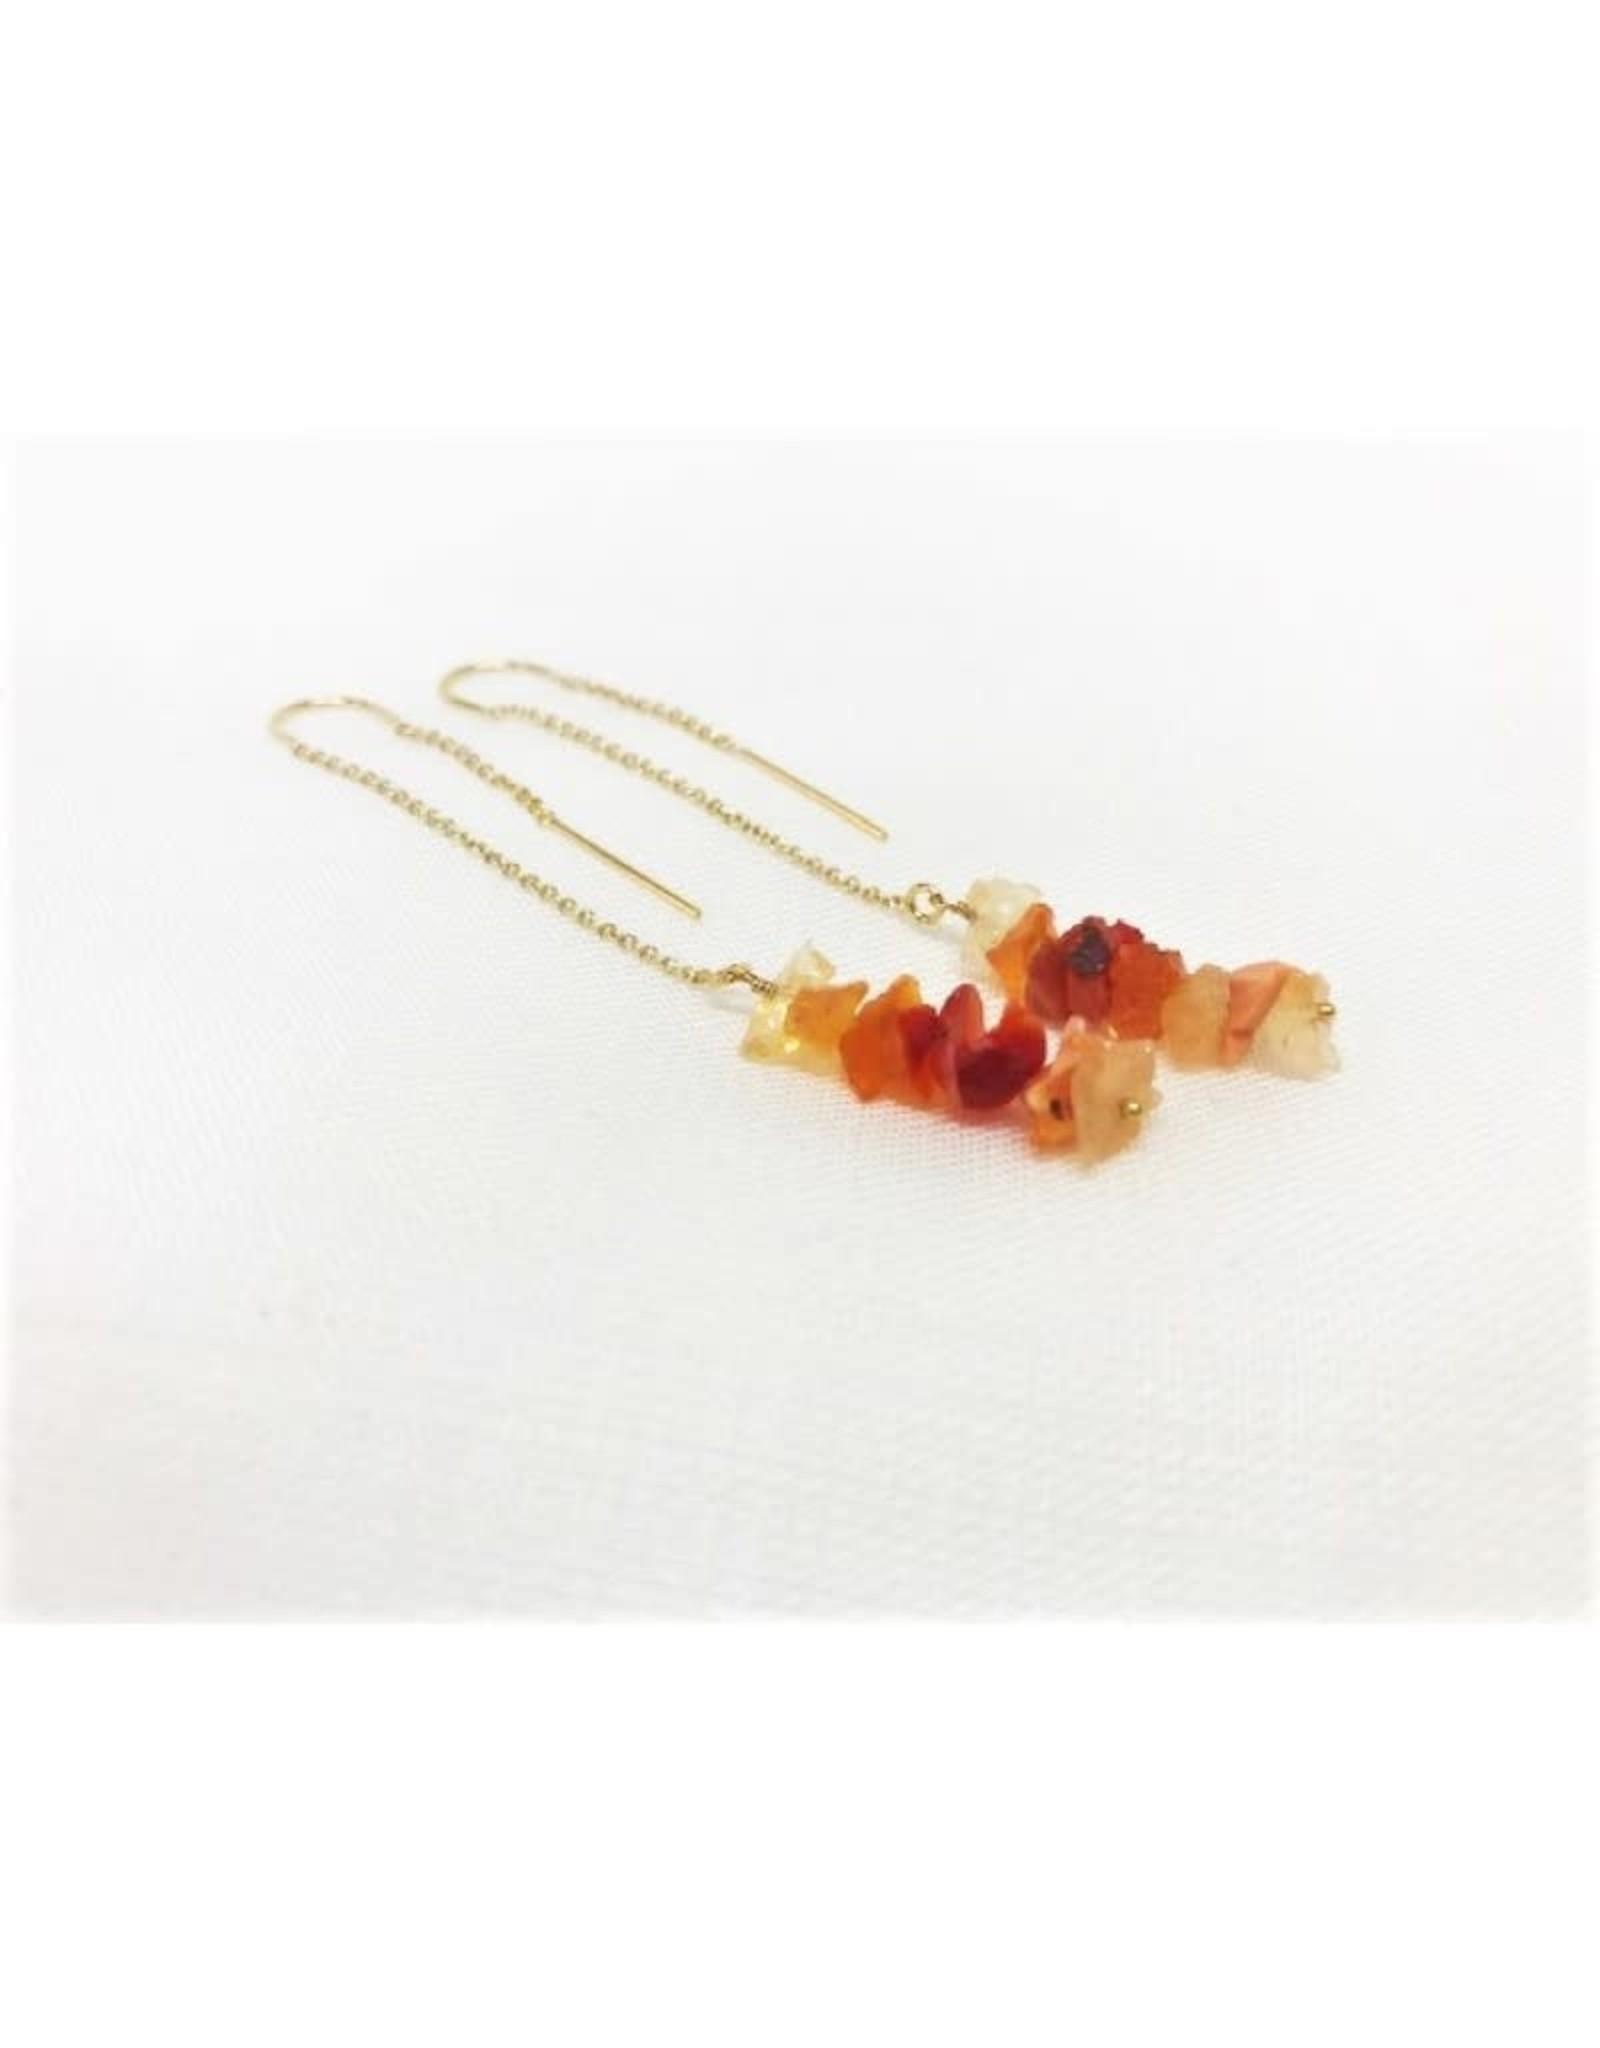 Thread Through Earrings - Fire Opal/Gold